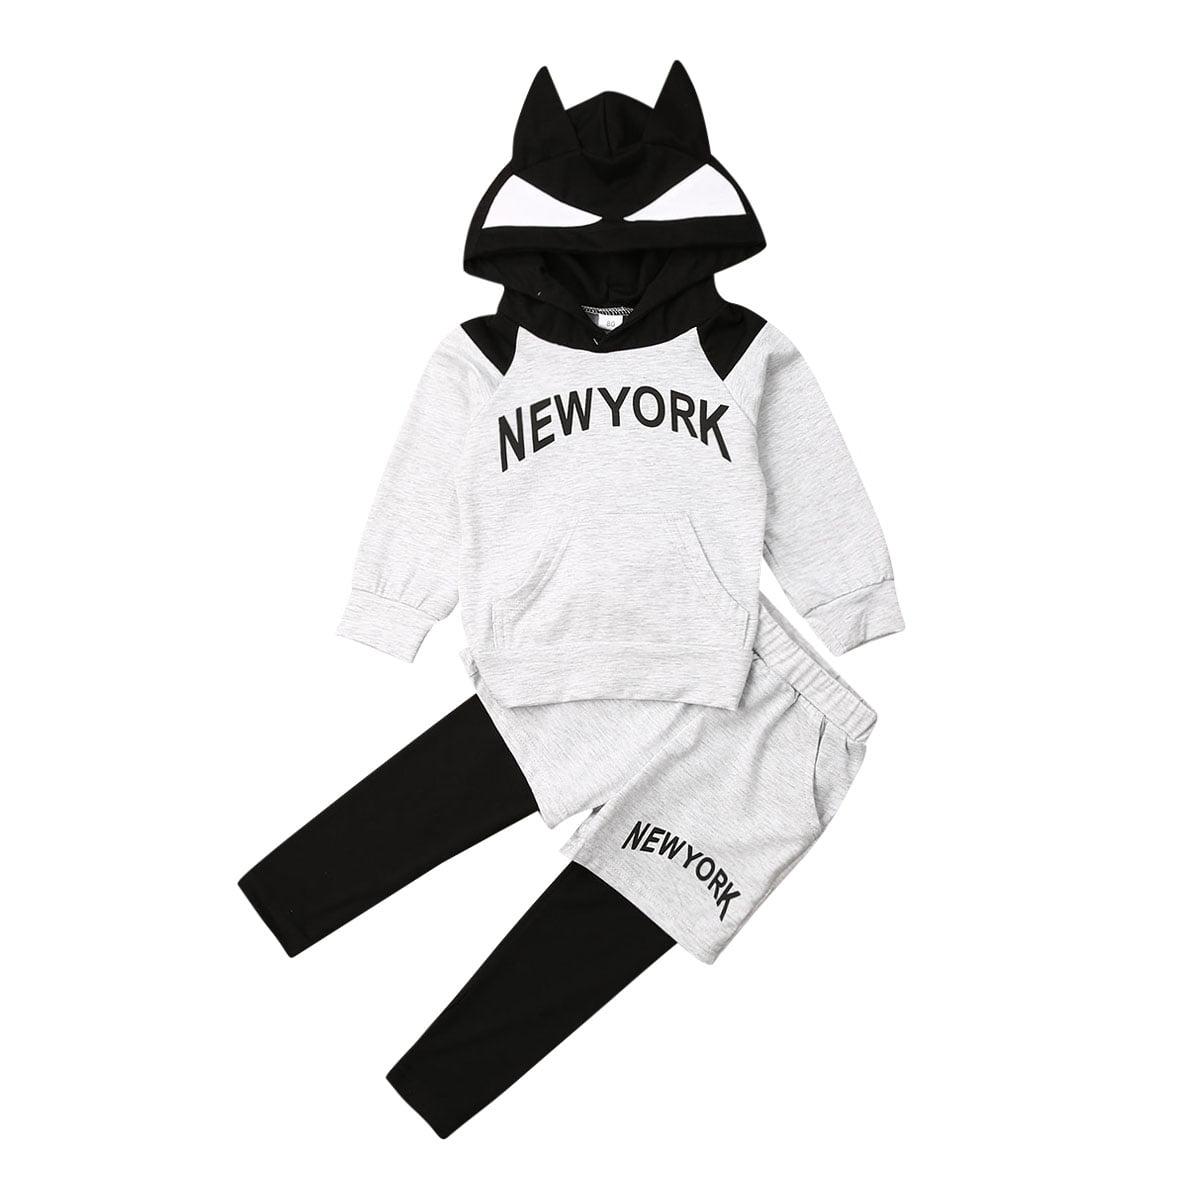 Baby Boy Sweat Suit Set Size 24m Long Sleeve